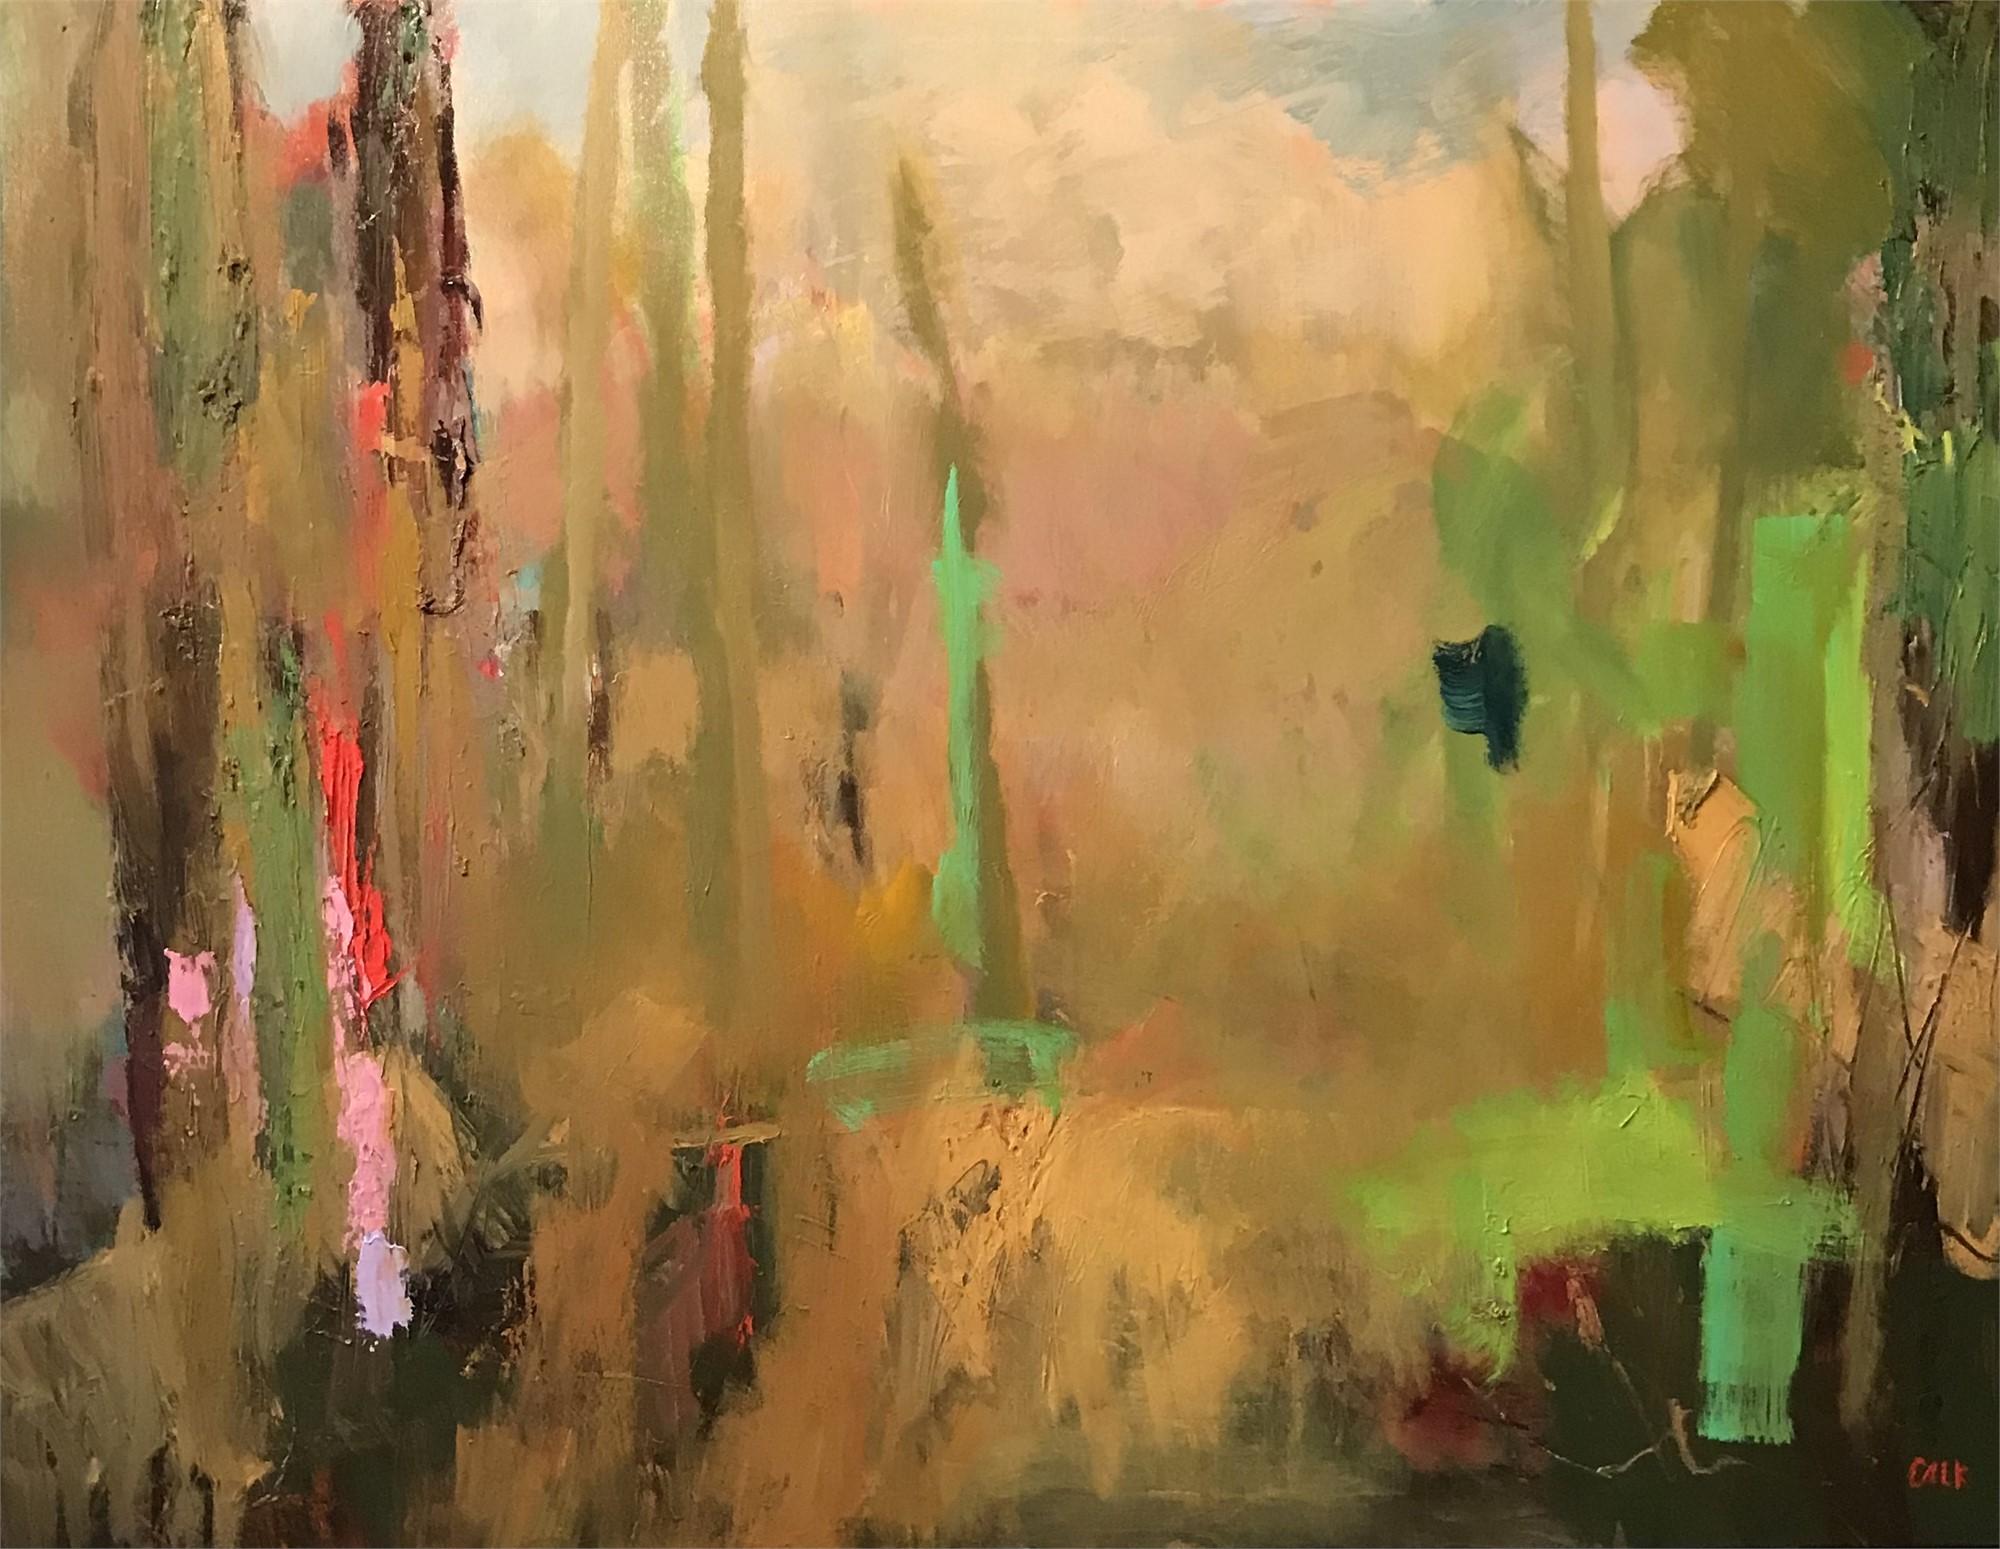 Swamp Series I by James Calk